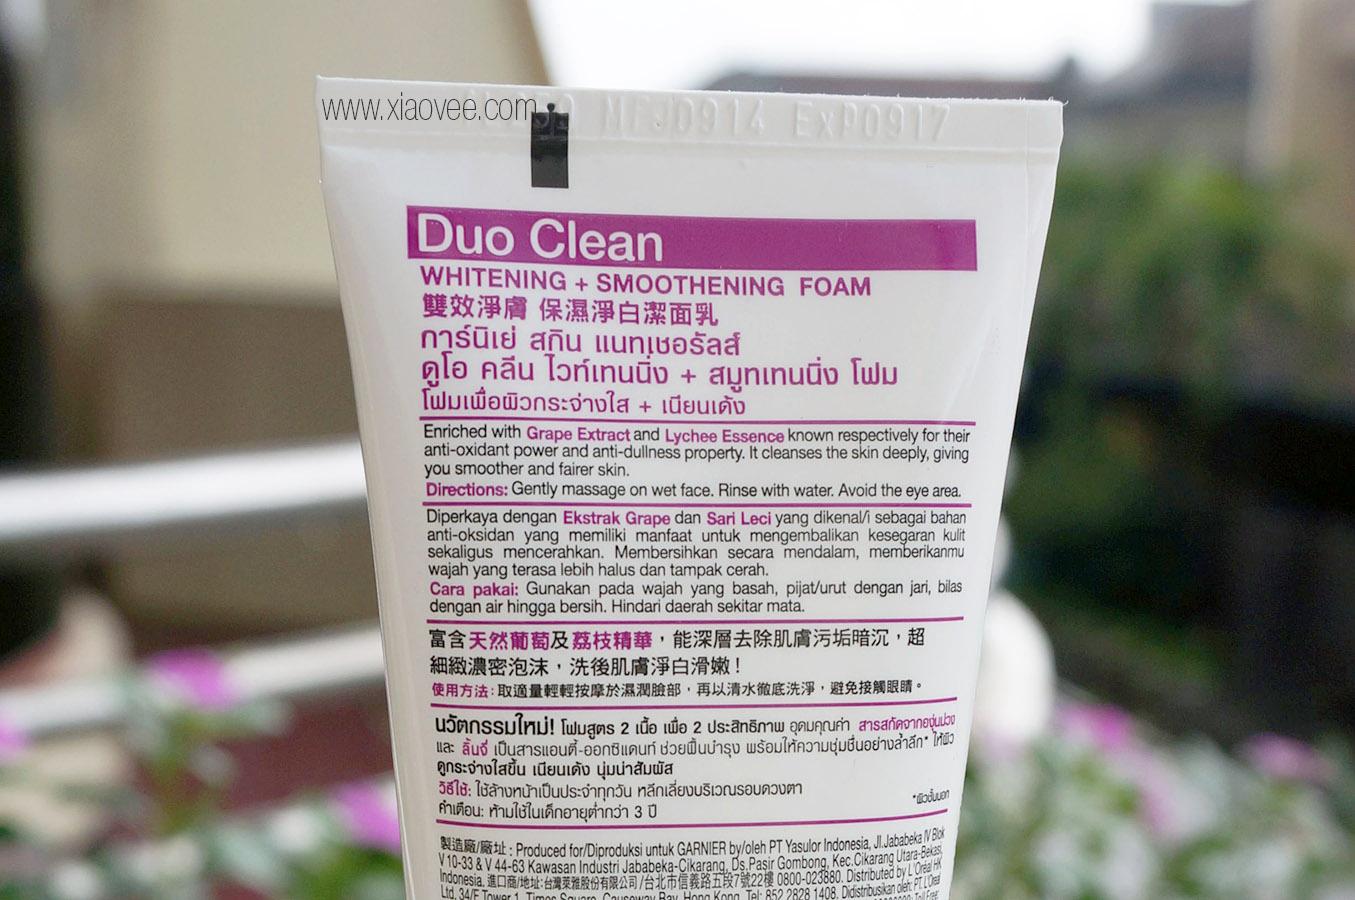 Garnier Duo Clean review